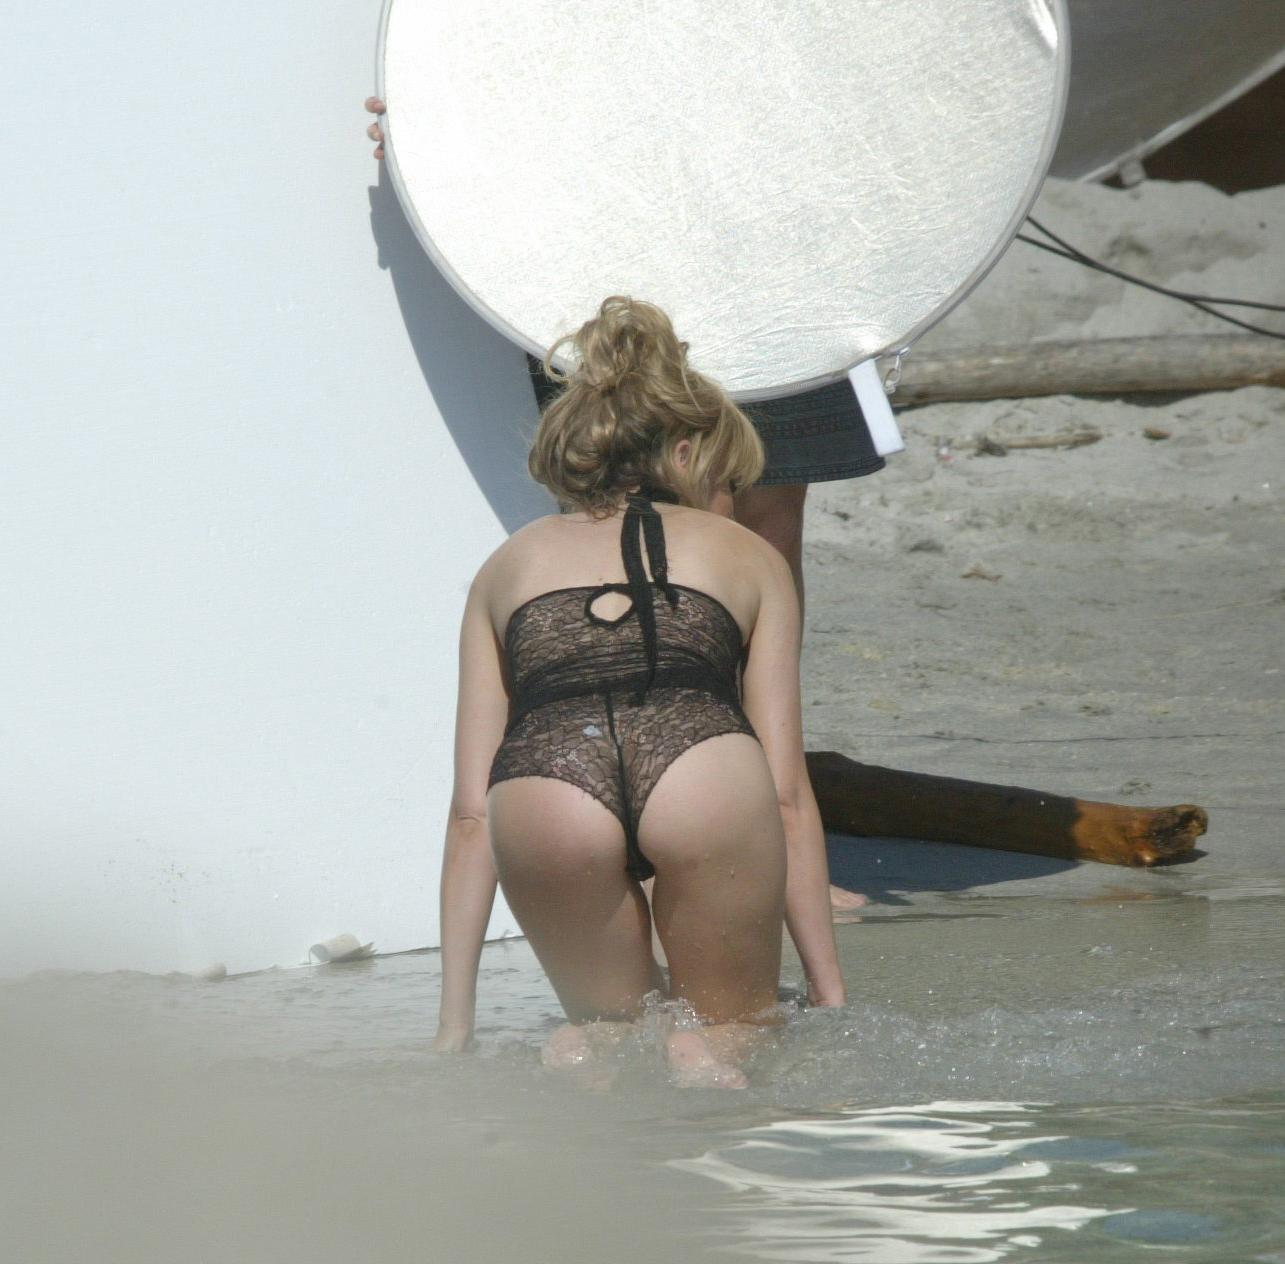 Milf pantyhose mistress